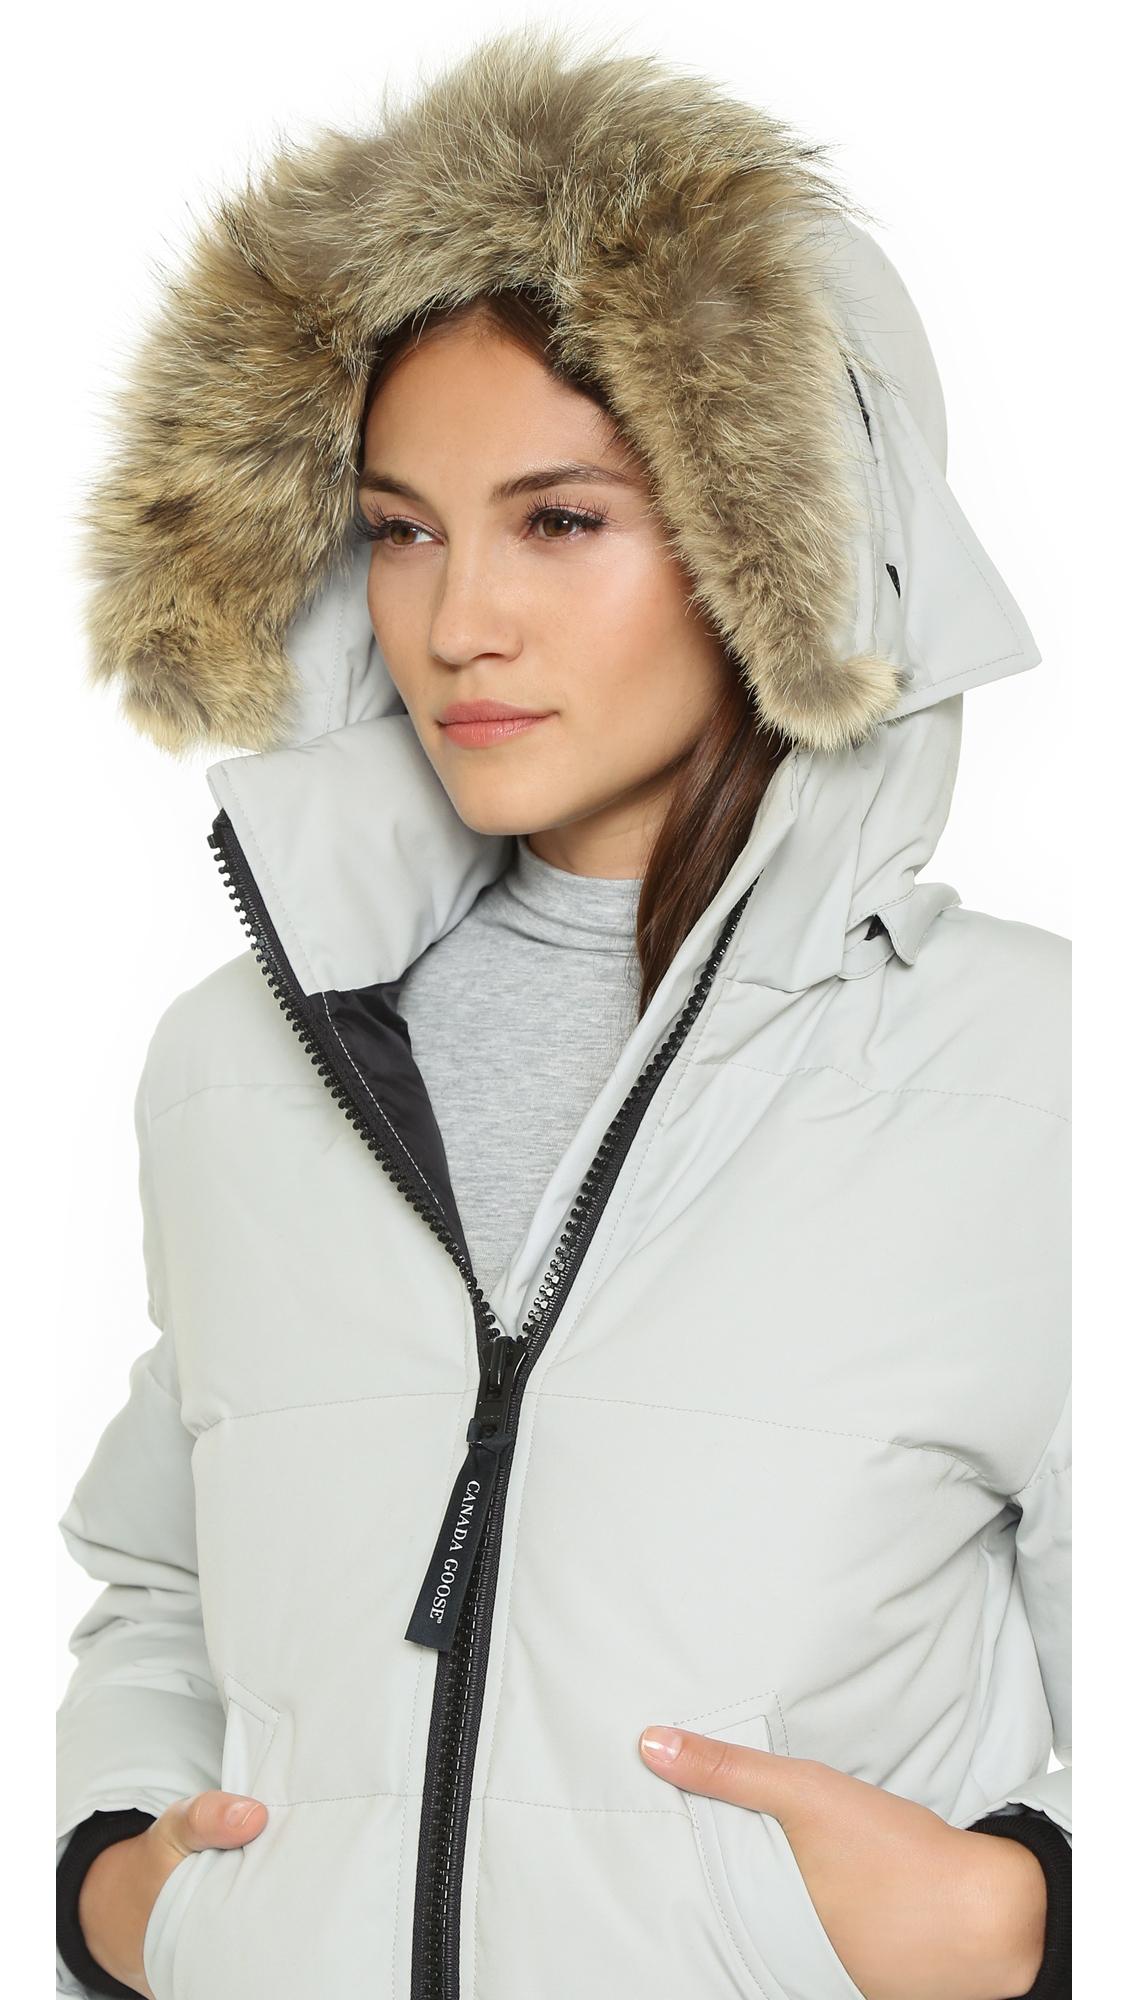 Canada Goose victoria parka sale price - Canada goose Mystique Parka - Silverbirch in Gray (Silverbirch) | Lyst